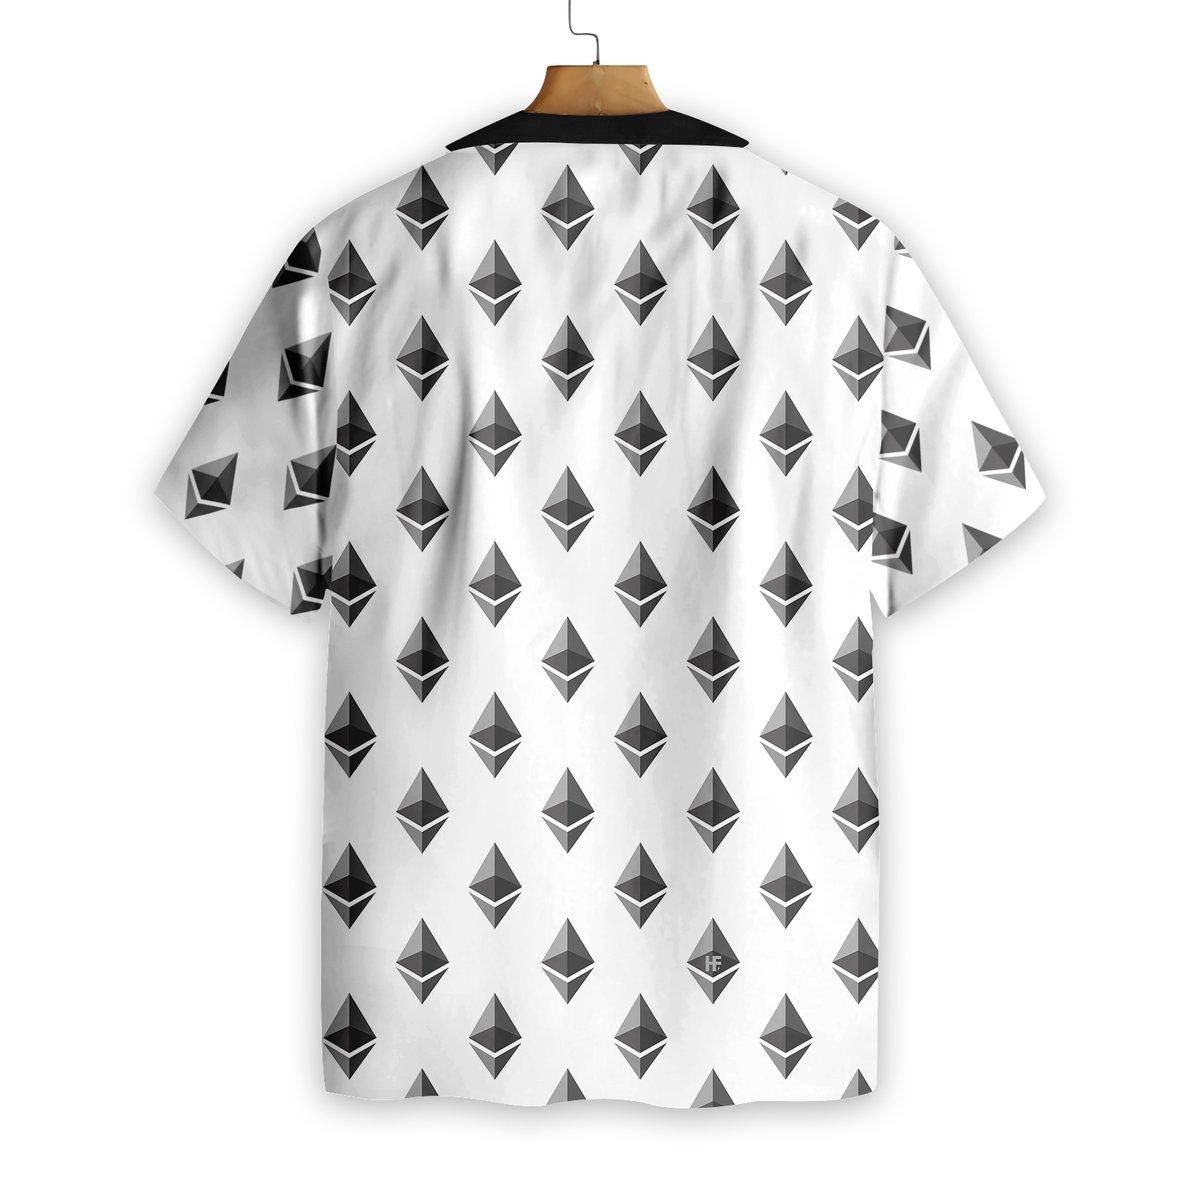 Seamless Ethereum Cryptocurrency EZ20 1802 Hawaiian Shirt 2 1200x